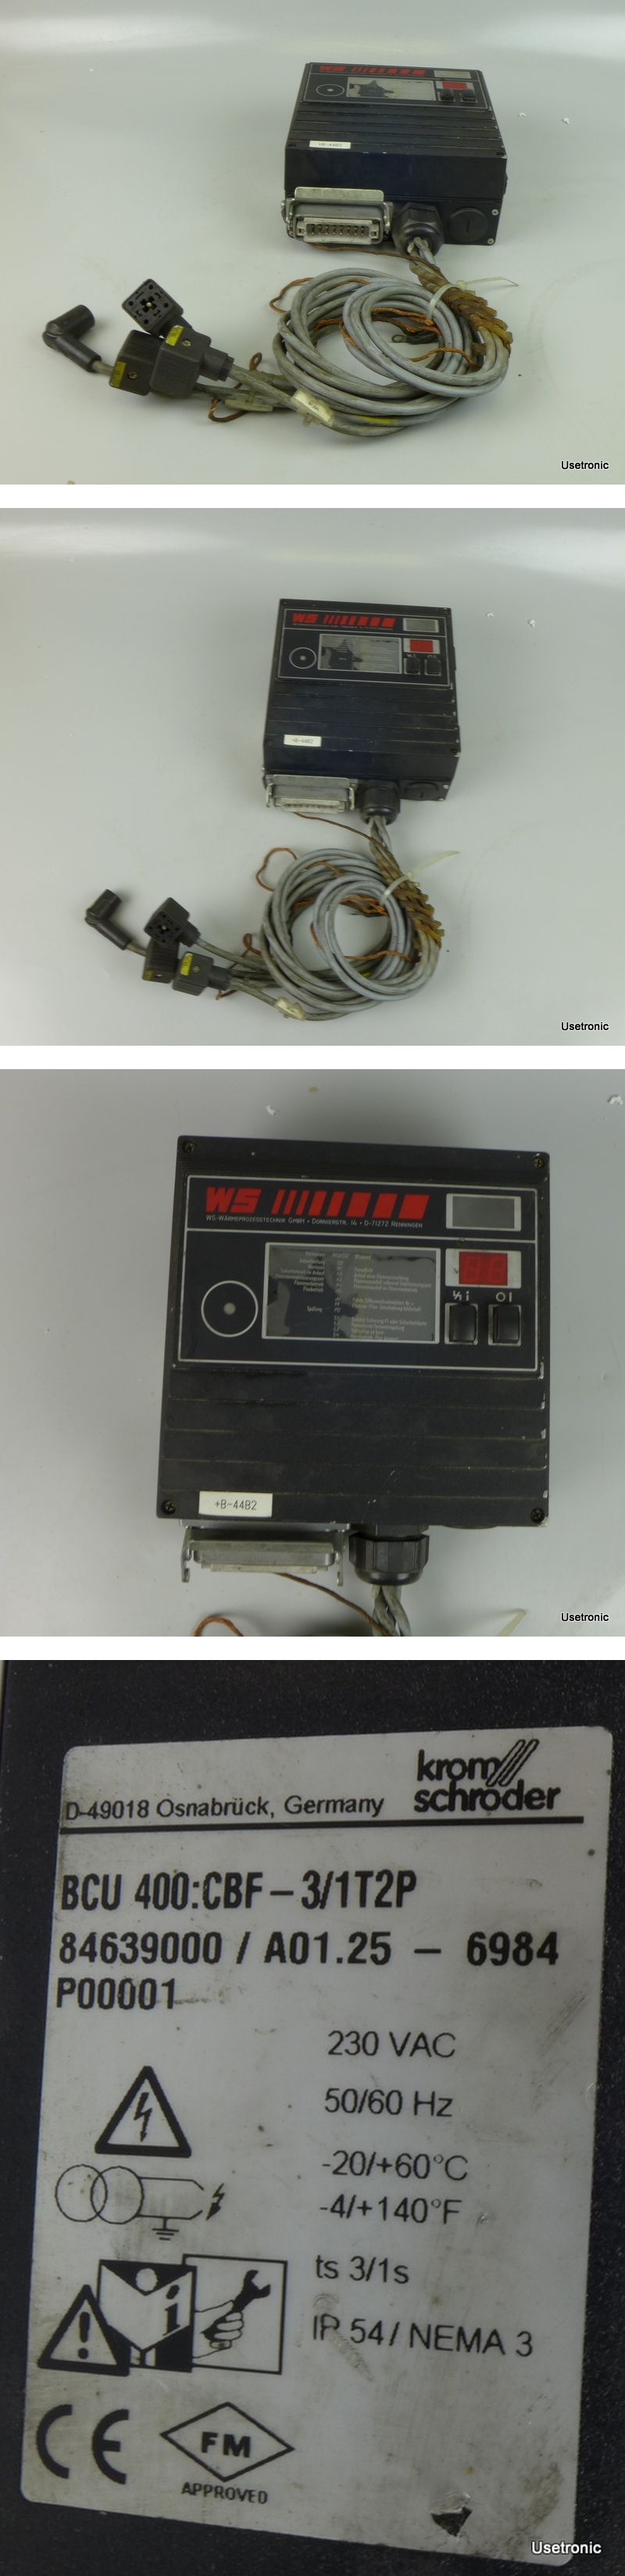 Kromschröder BCU 400 CBF-3/1T2P